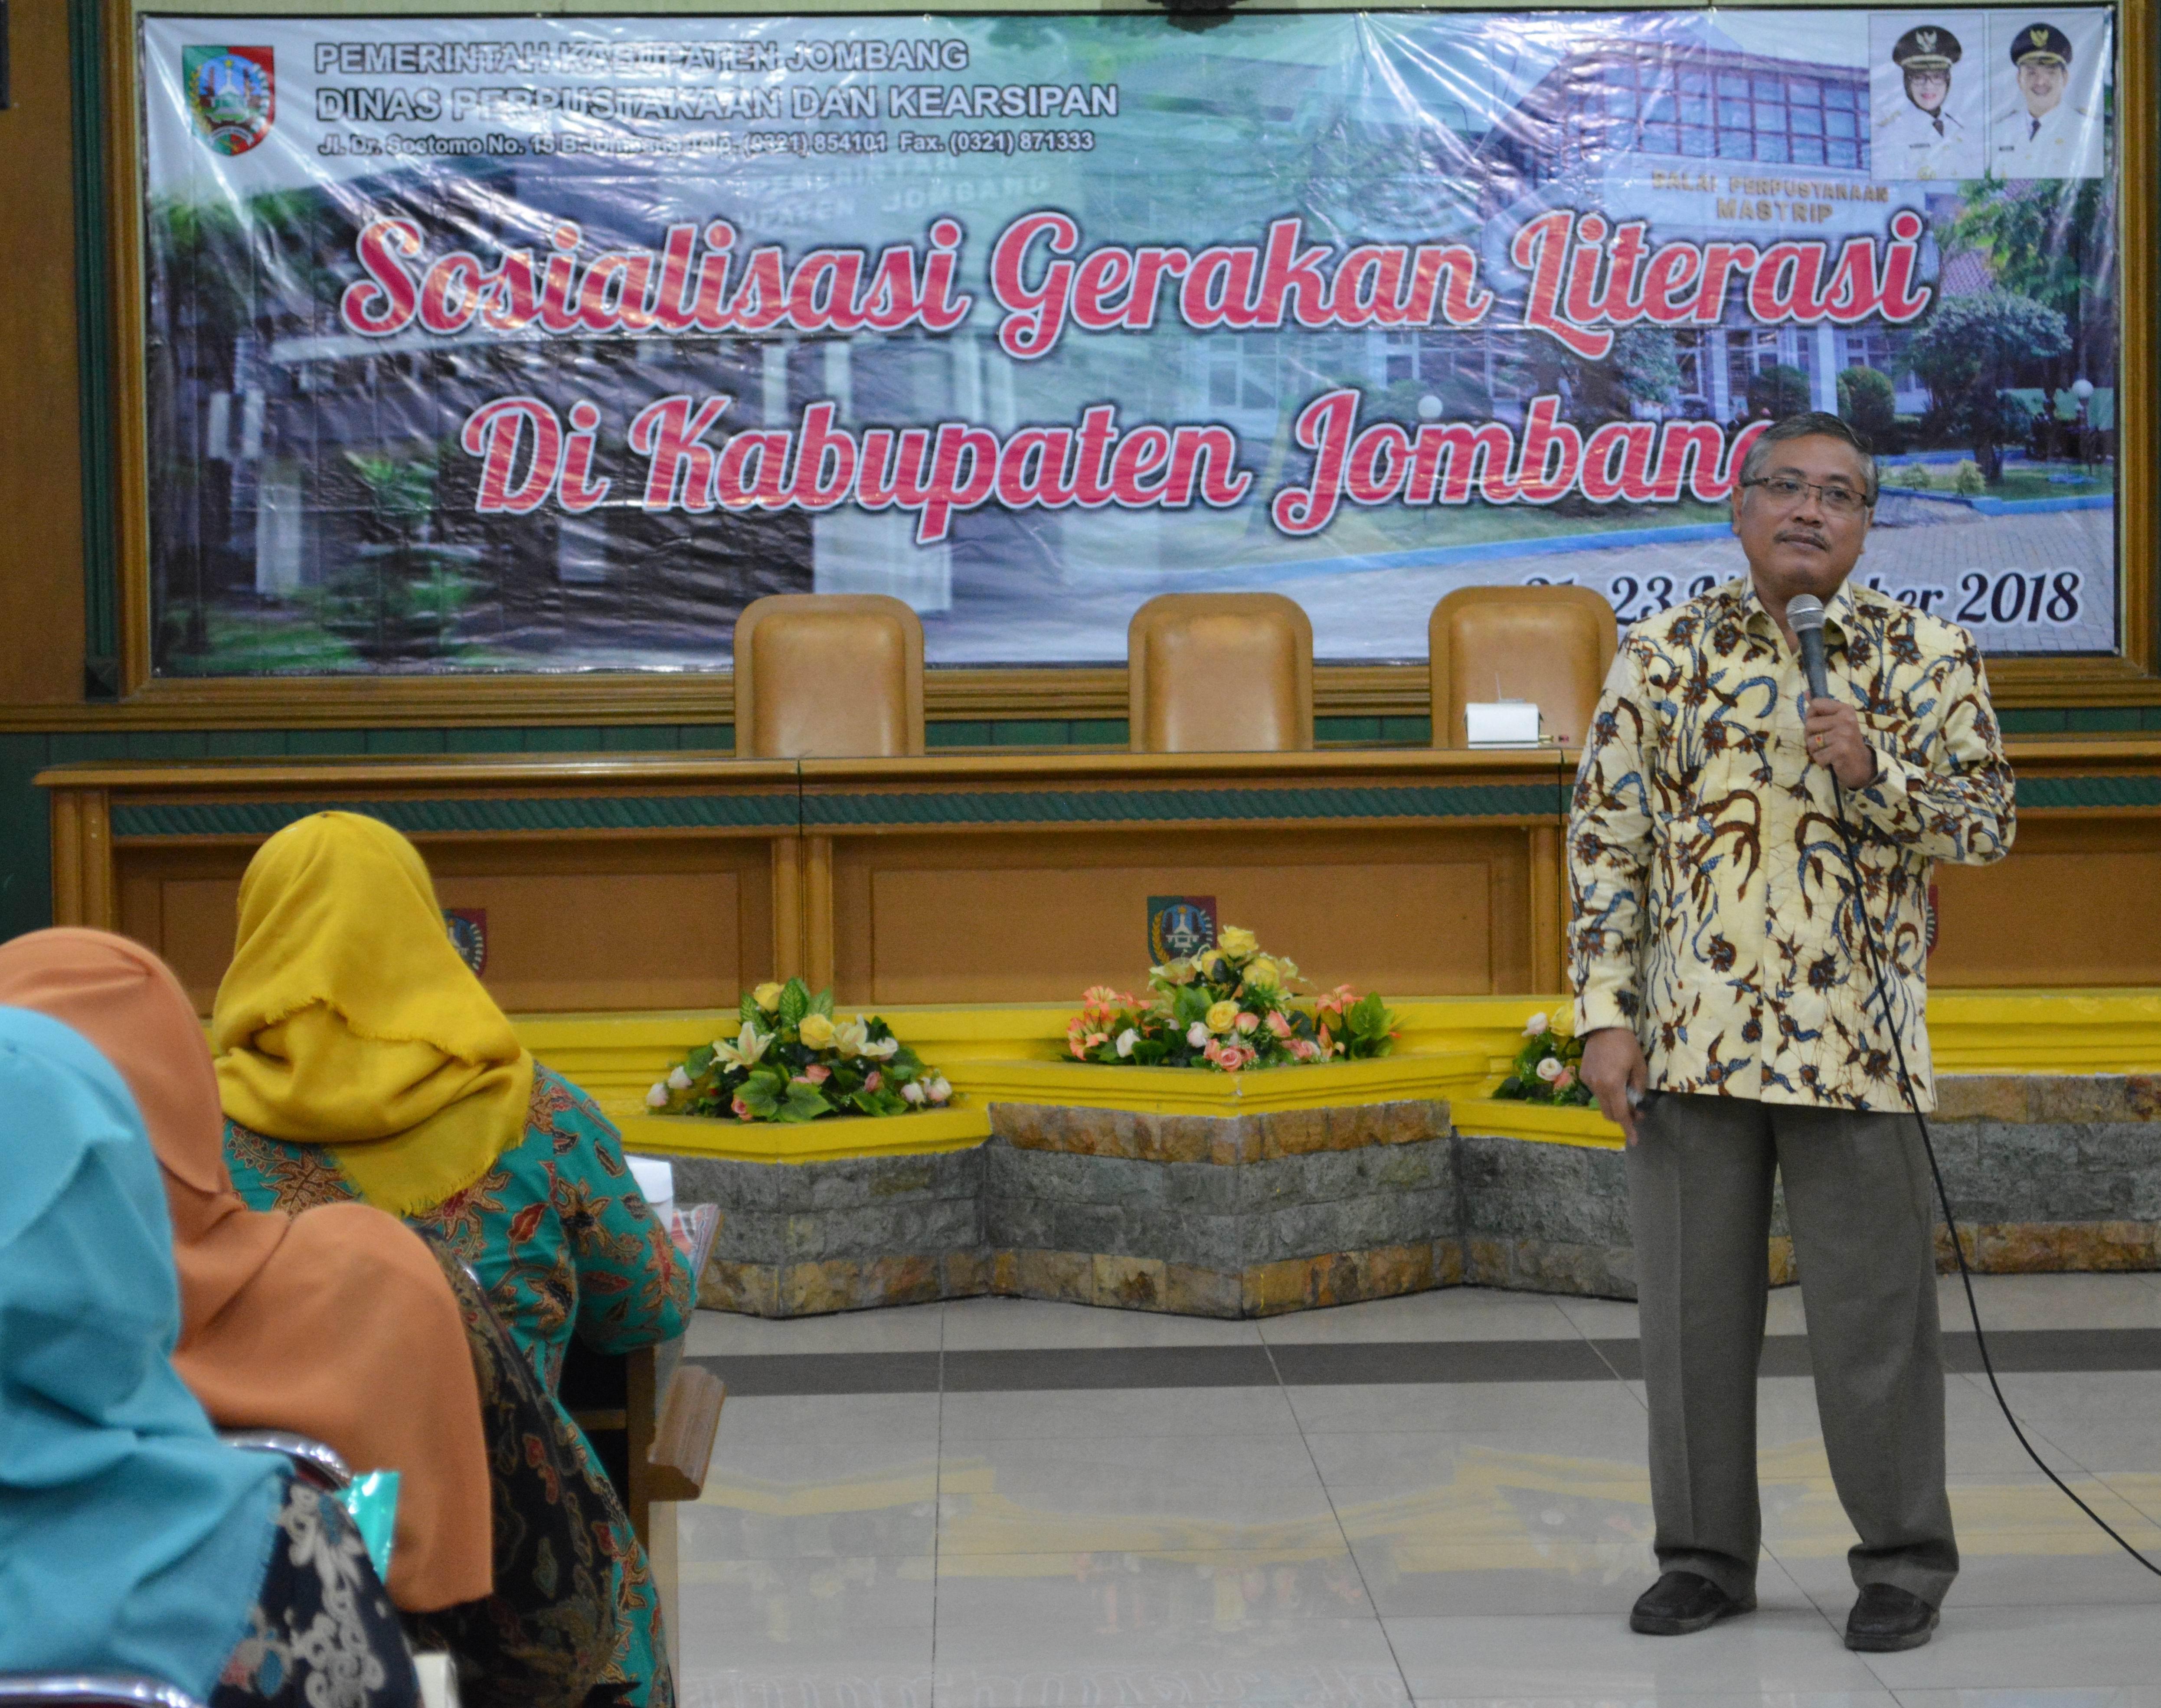 Sosialisasi Gerakan Literasi di Kabupaten Jombang tanggal 22 Nopember 2018